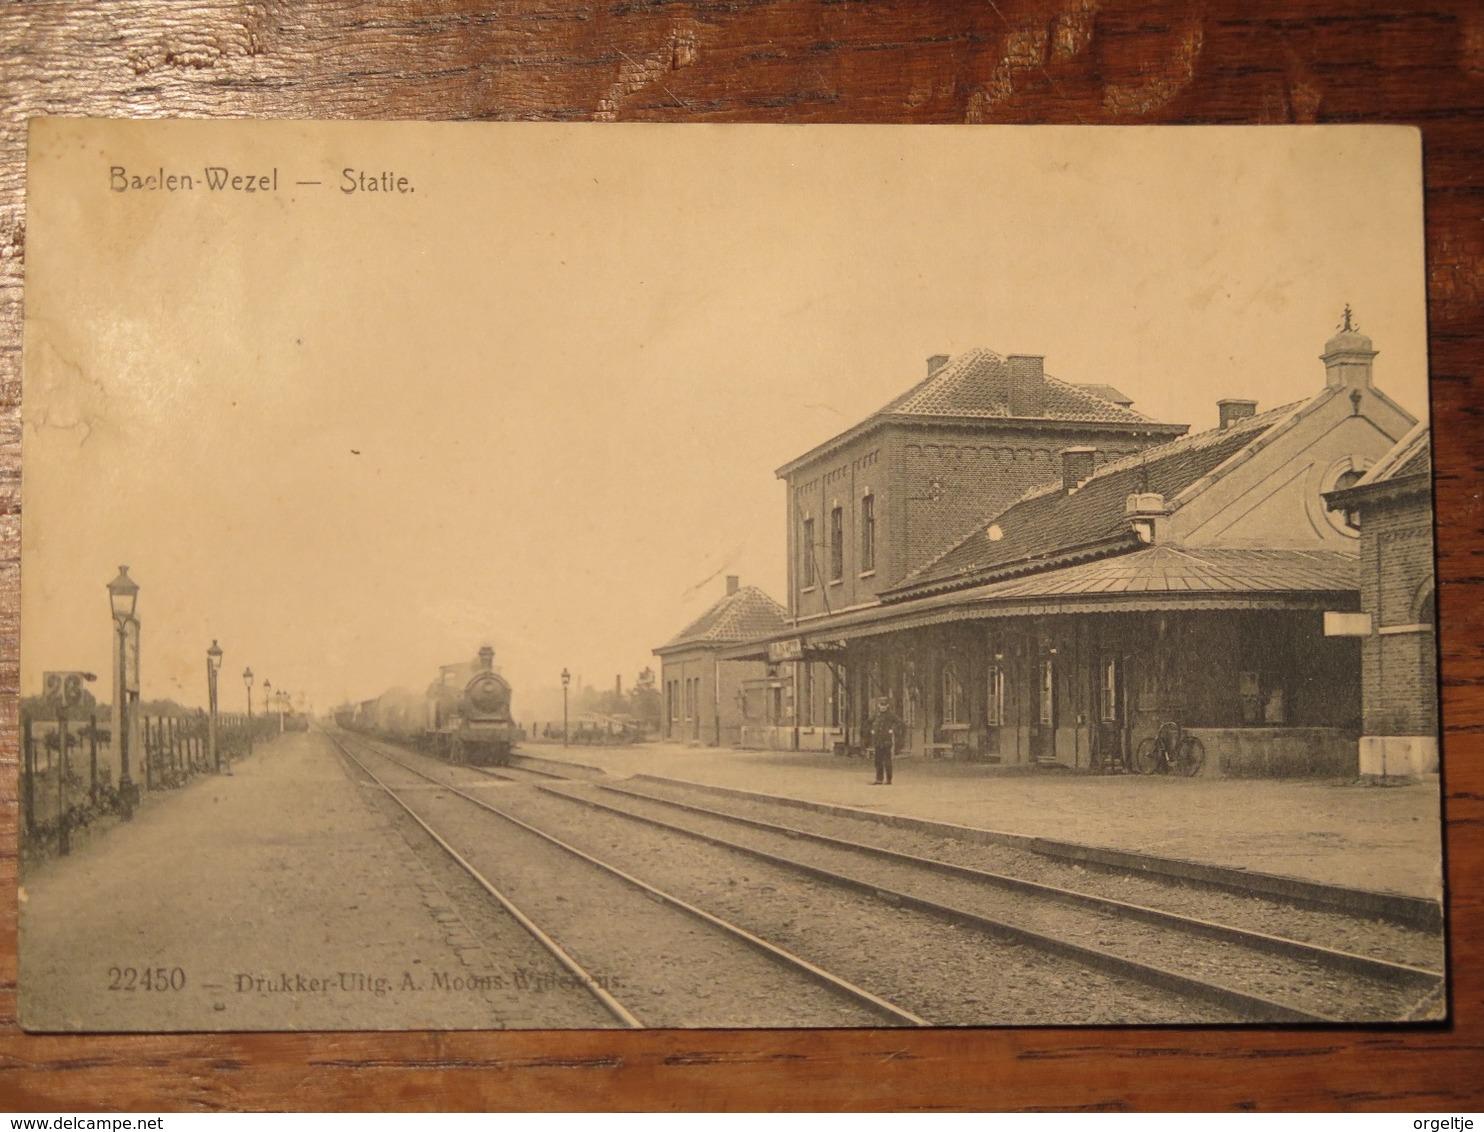 Baelen-Wezel(Balen) Statie(station)Feldpostkarte WO I - Balen